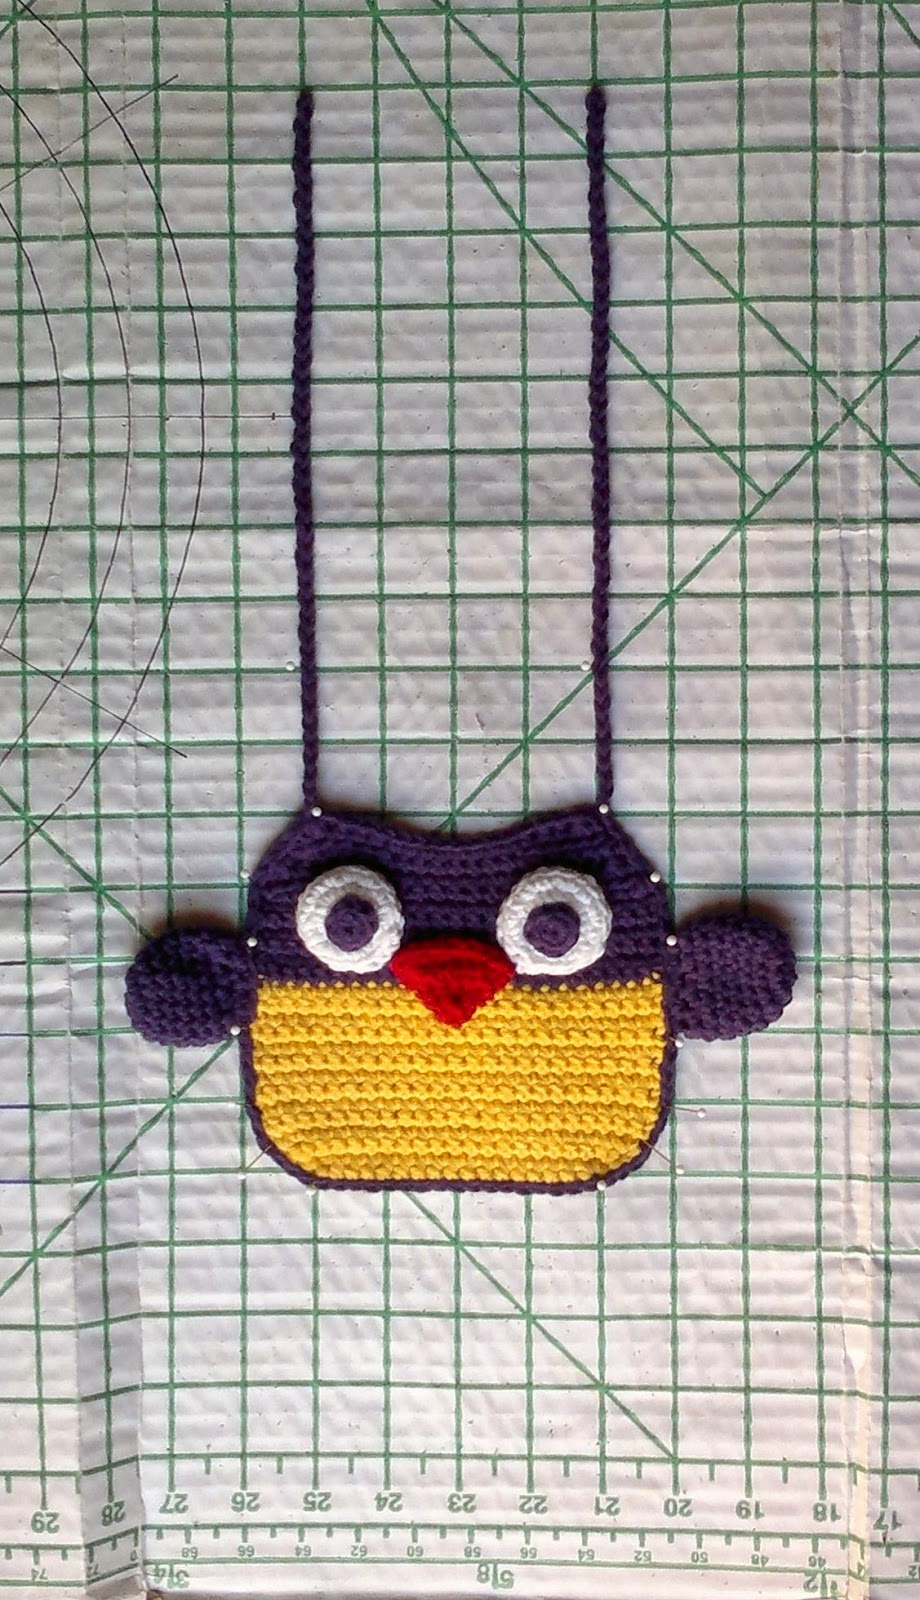 Crocheted owl bib laid out on blocking board grid.